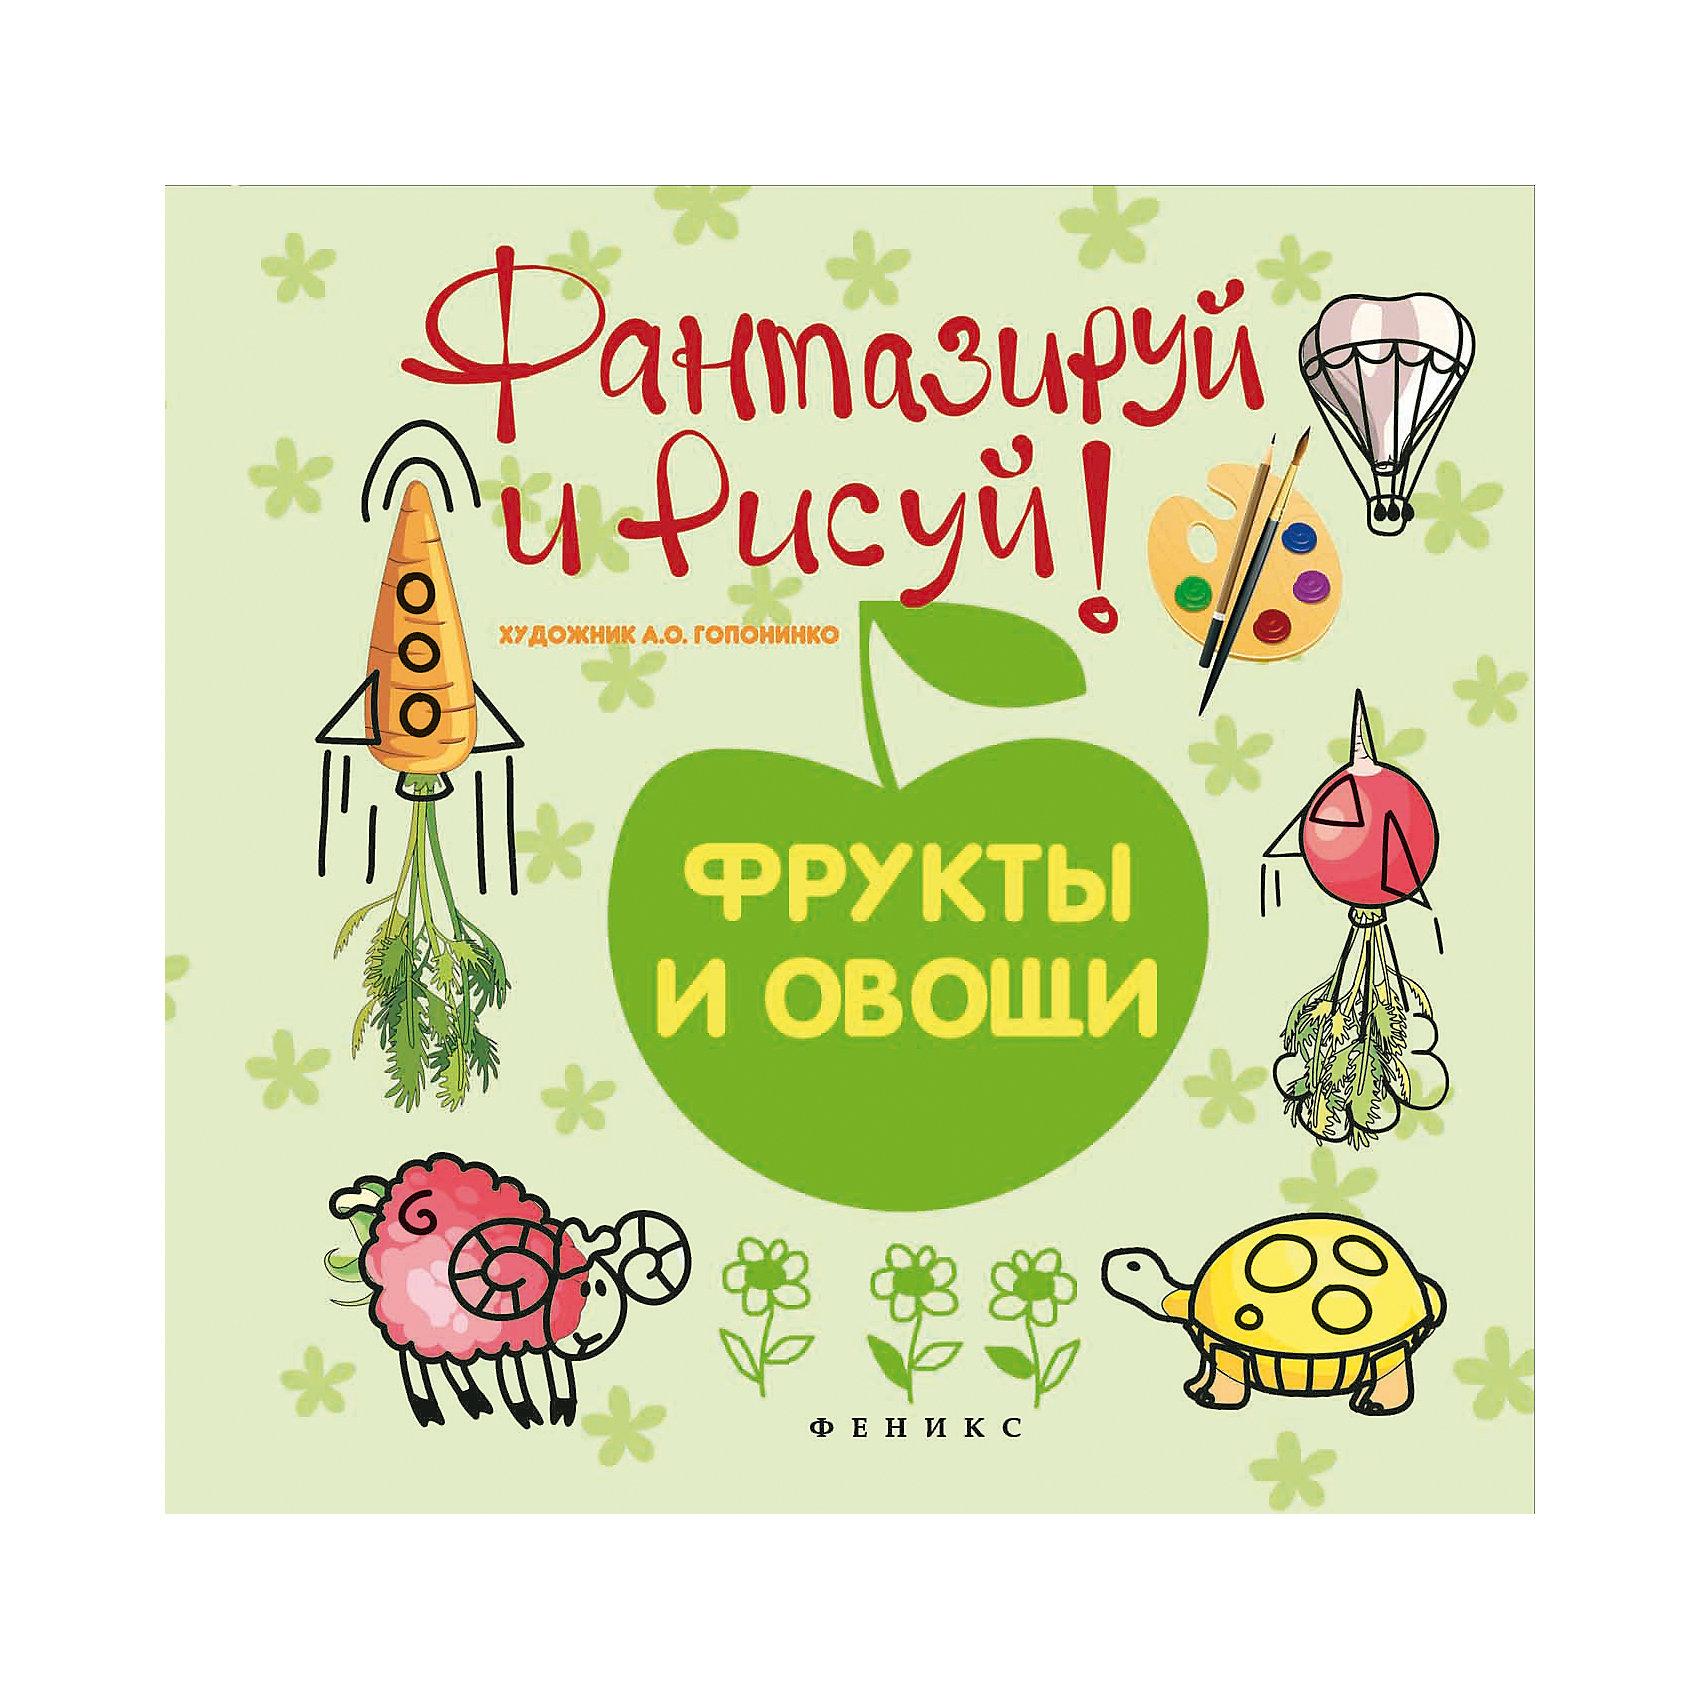 Fenix Фантазируй и рисуй: фрукты и овощи фрукты и овощи